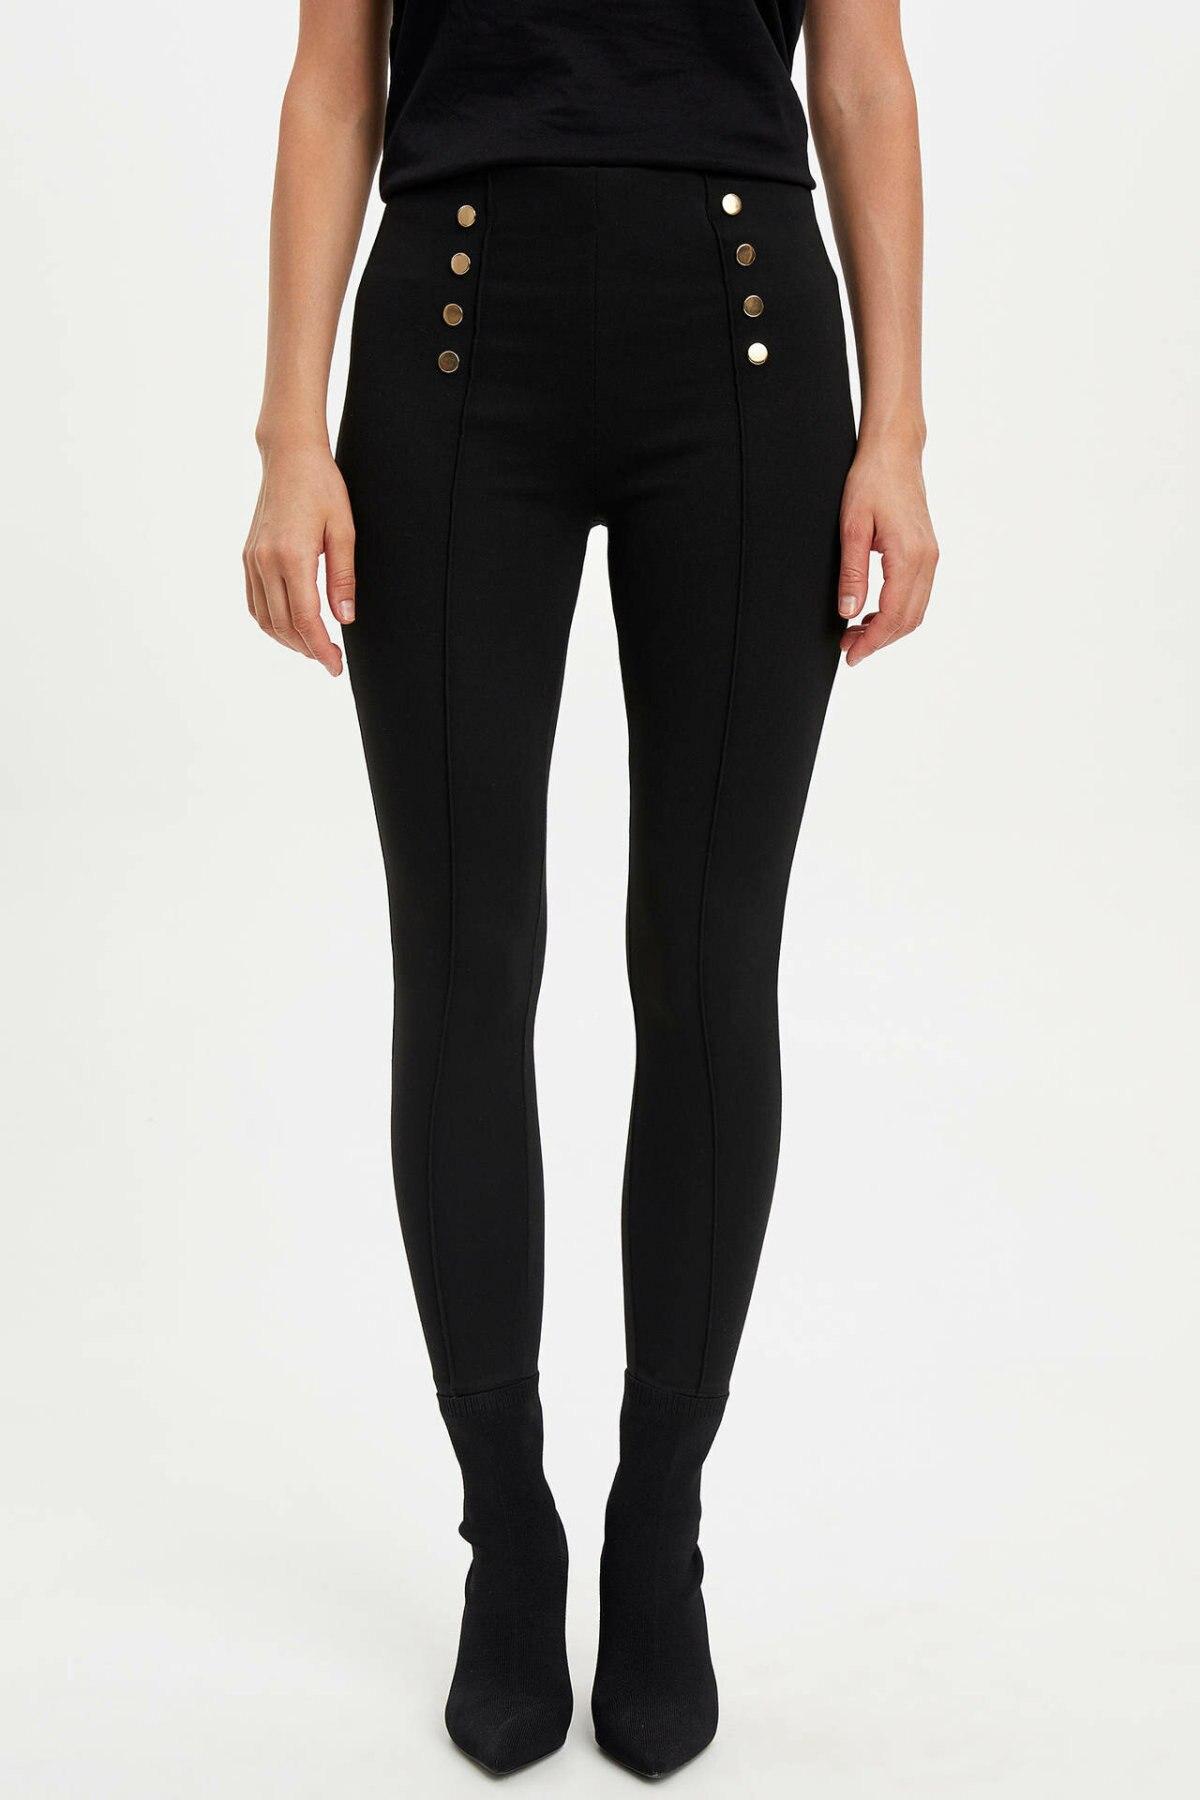 DeFacto Female Fashion Solid Leisure Slim Pants Trousers Women's Casual Double-breasted Pants Comfort Pants Ladies -K9484AZ19AU